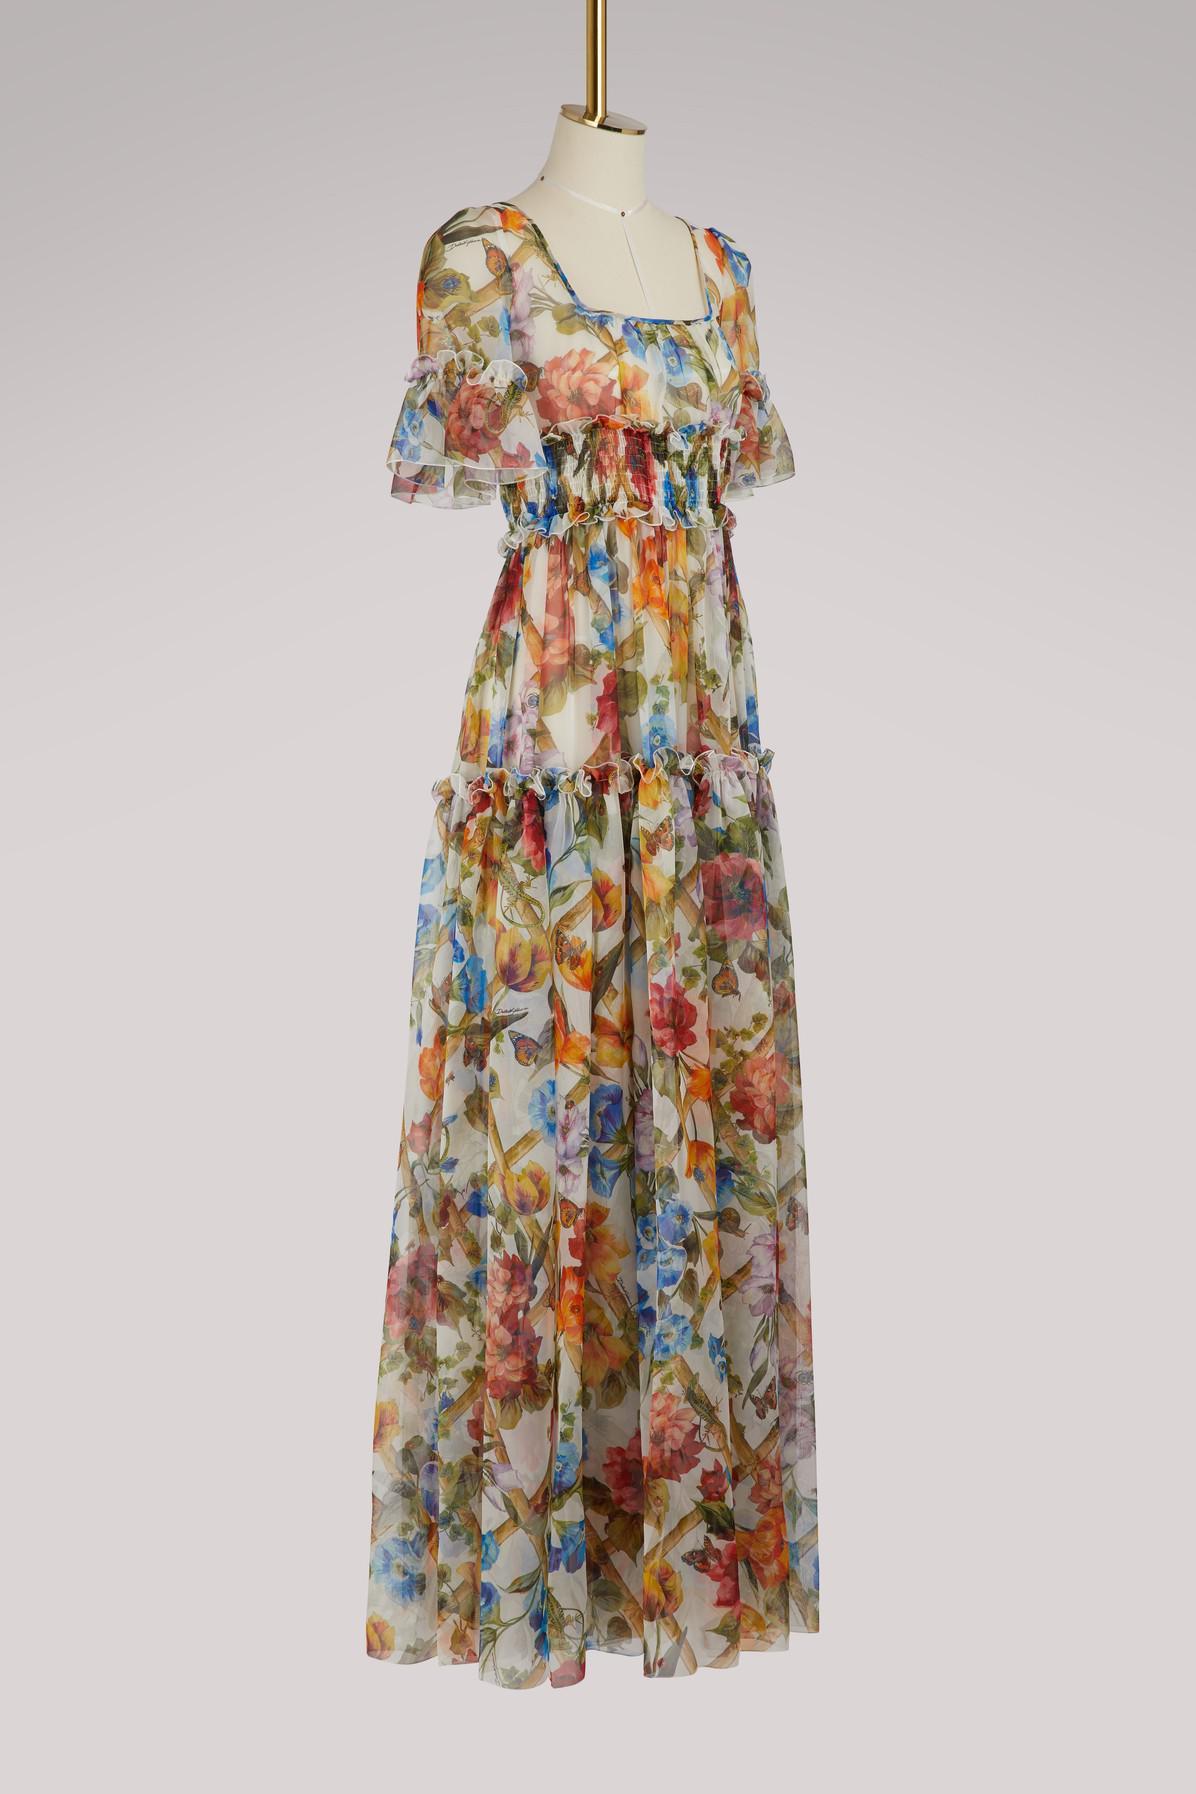 ed9d78c4071 Dolce   Gabbana Bamboo Print Silk Dress in White - Lyst